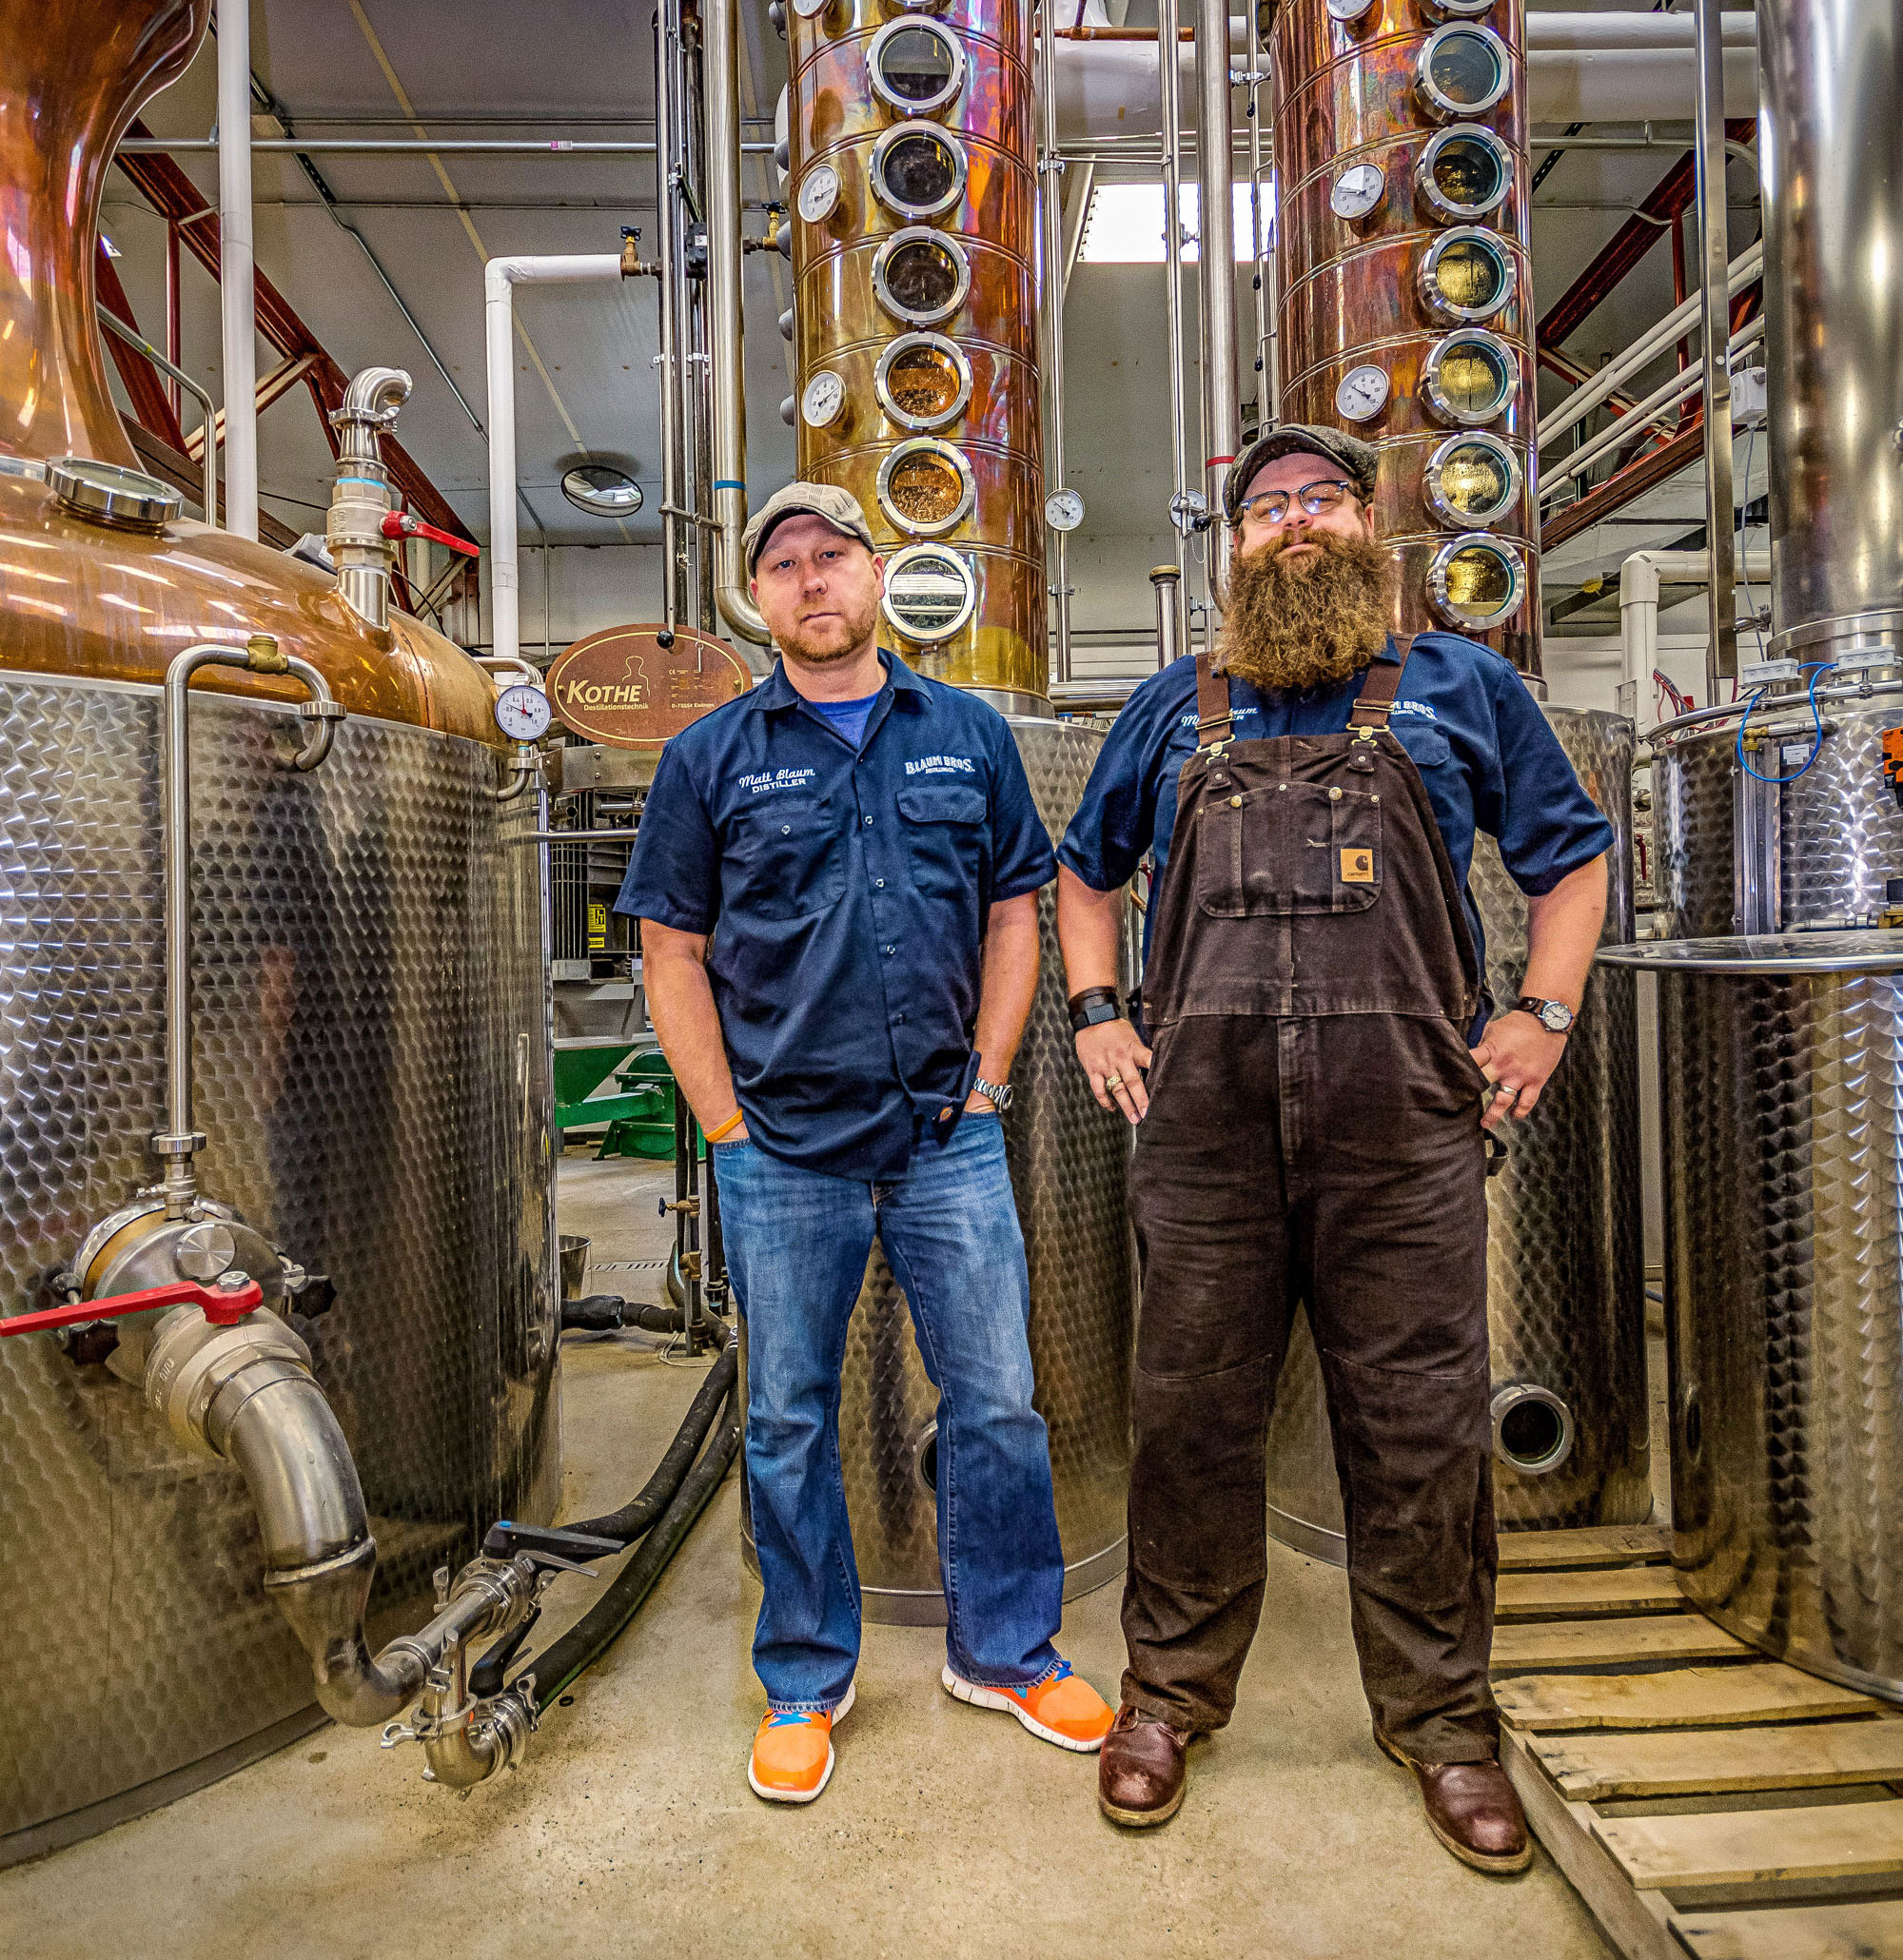 Blaum Bros. Distilling Company